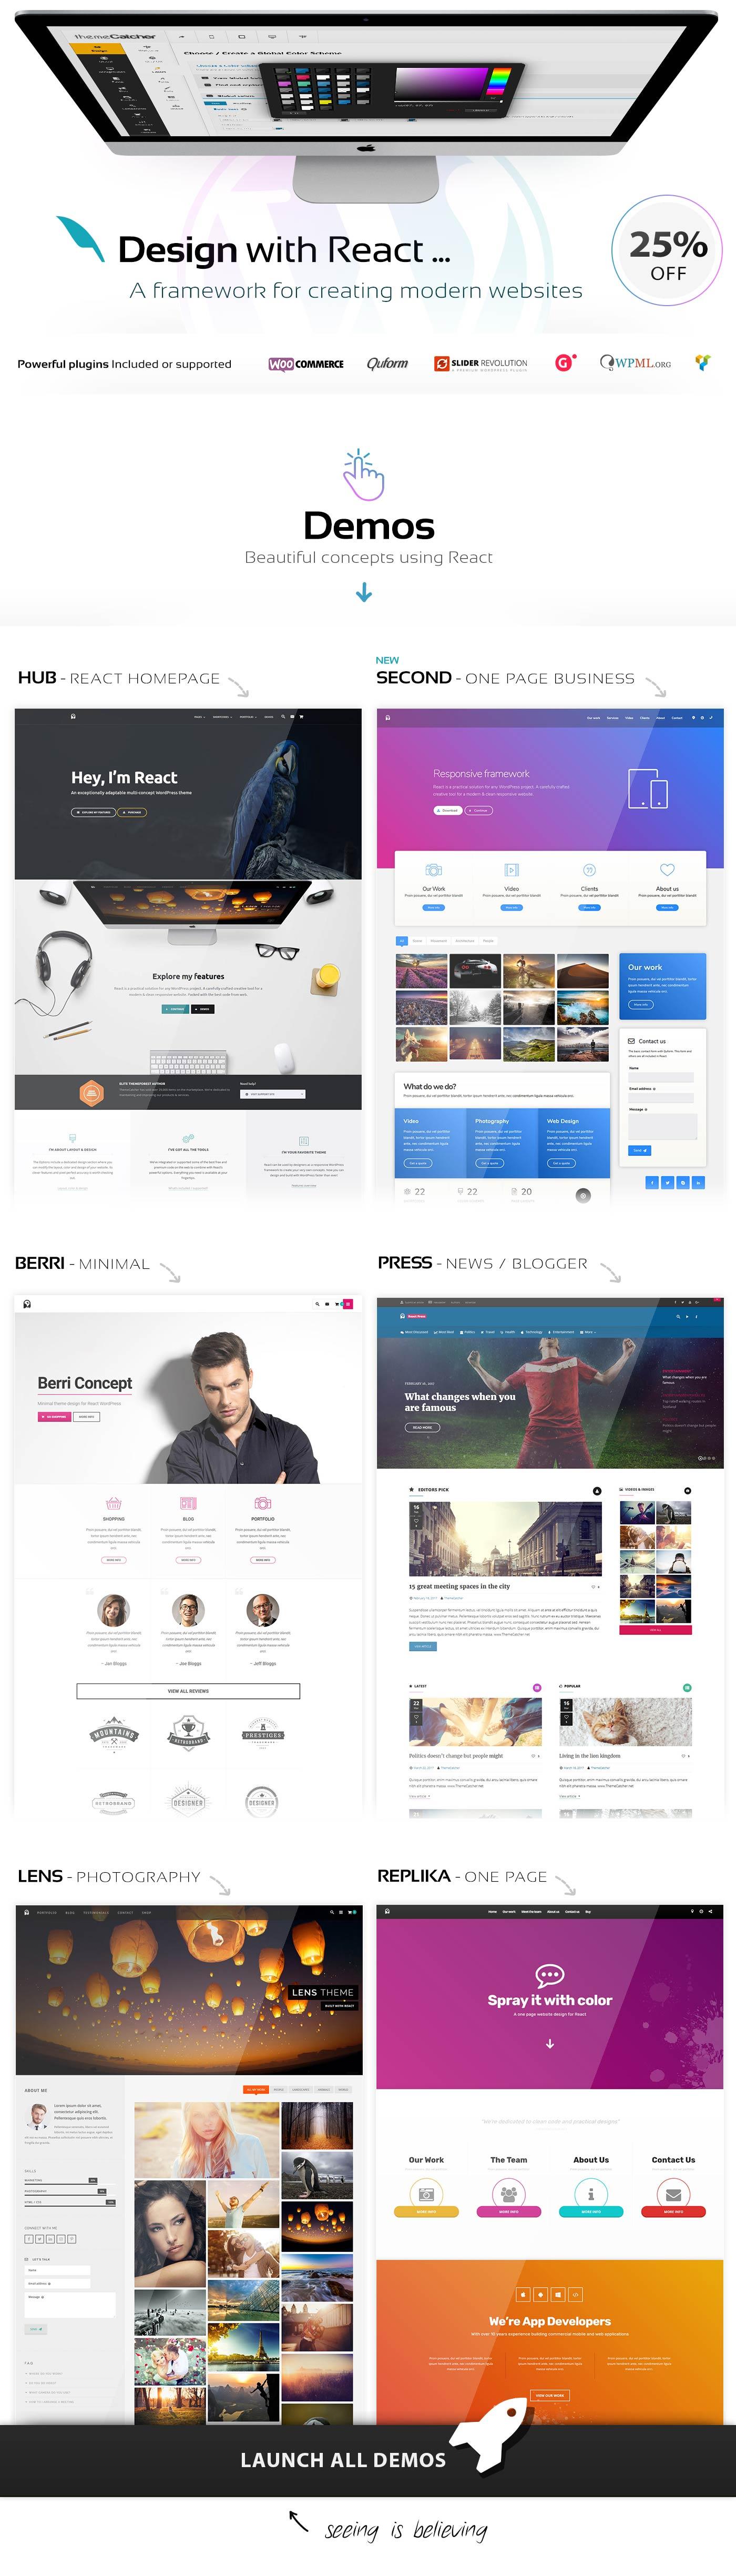 React - WordPress theme